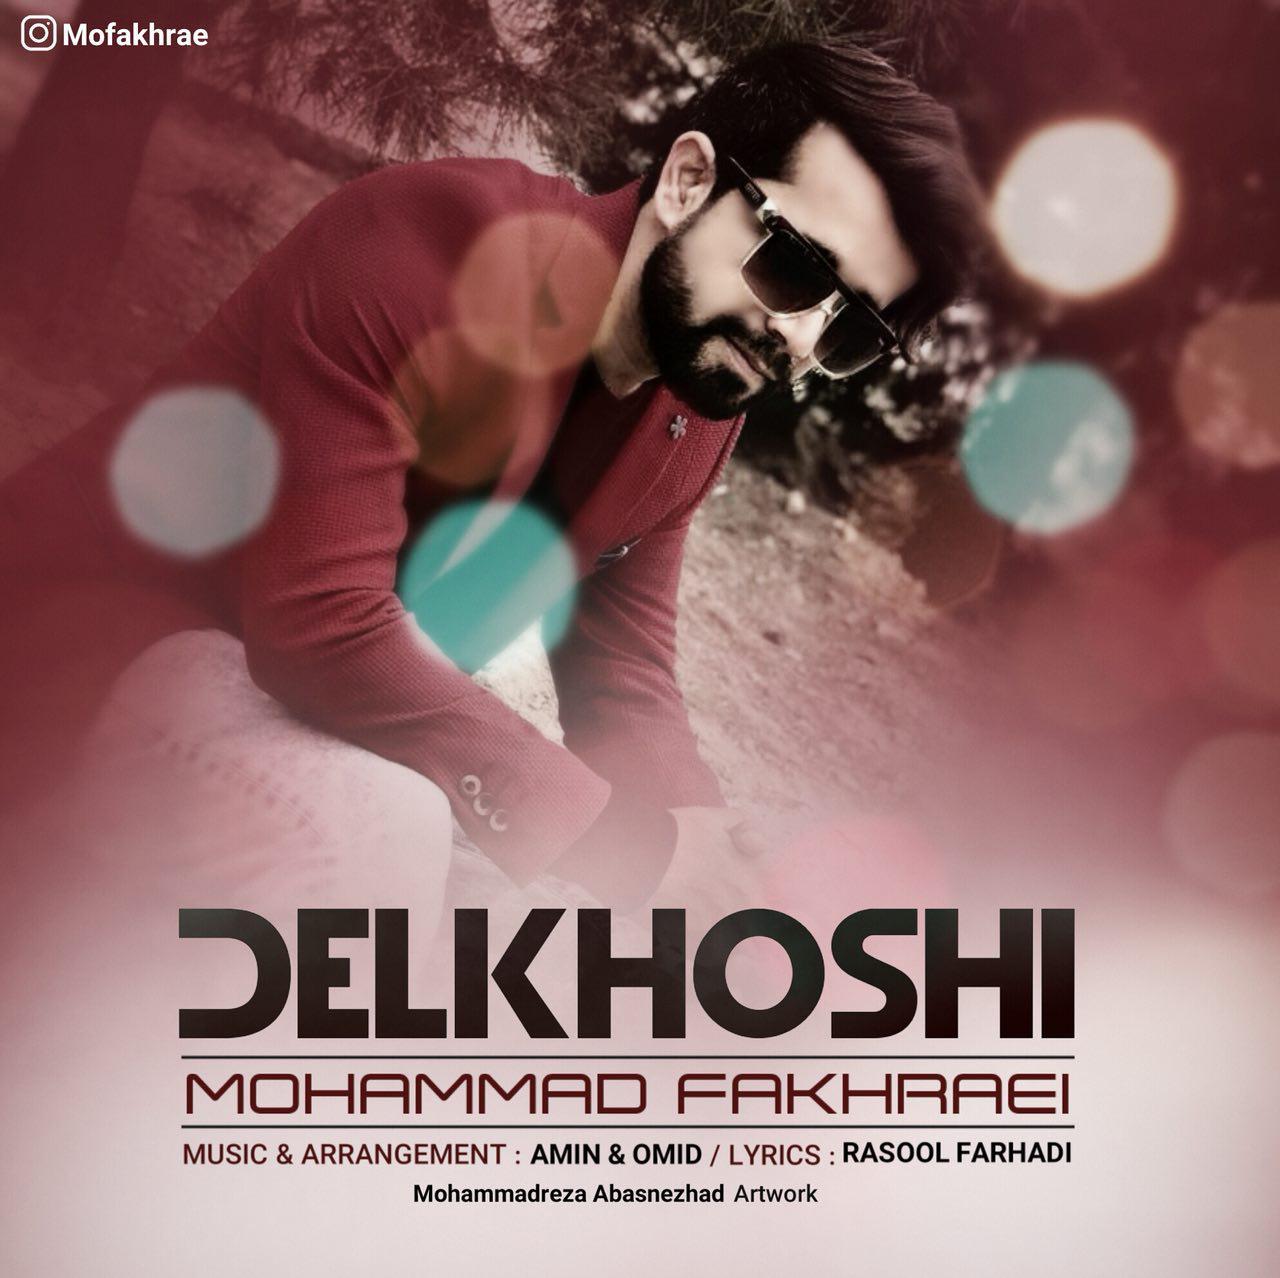 Mohammad Fakhraei – Delkhoshi